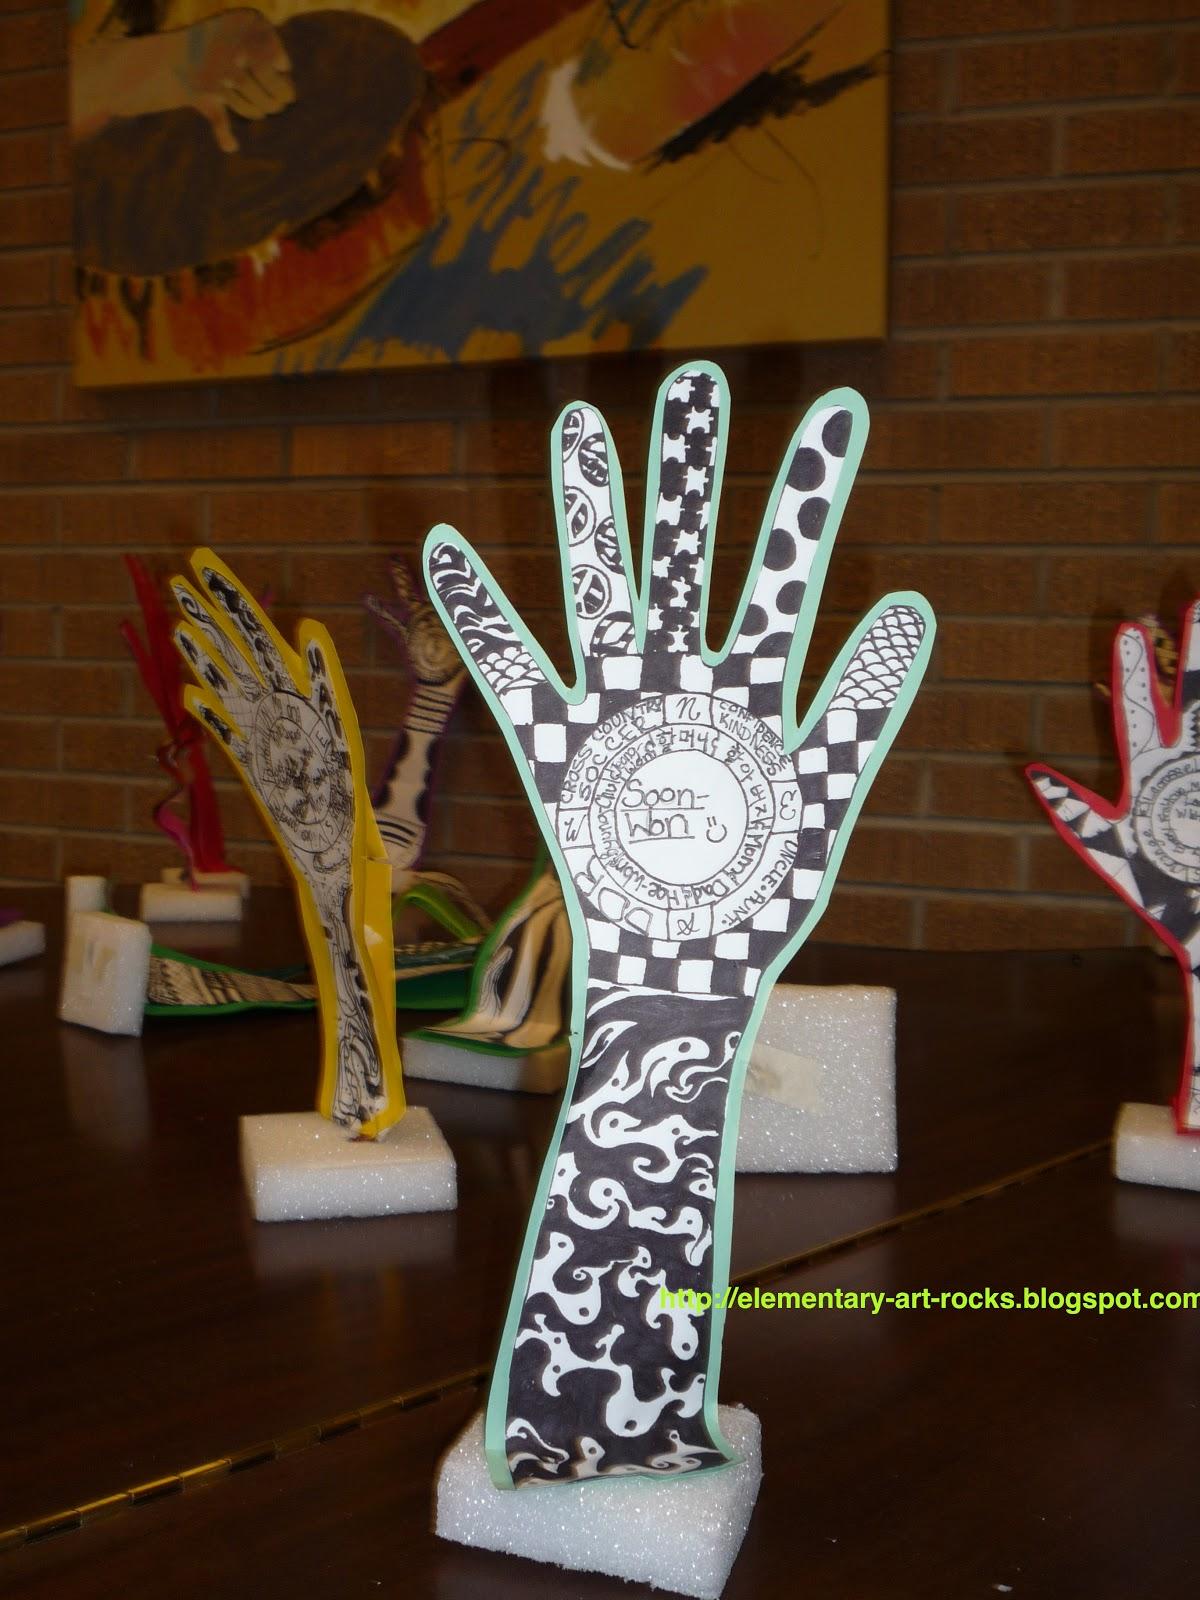 art rocks oldies but goodies grades 6 7 8 projects